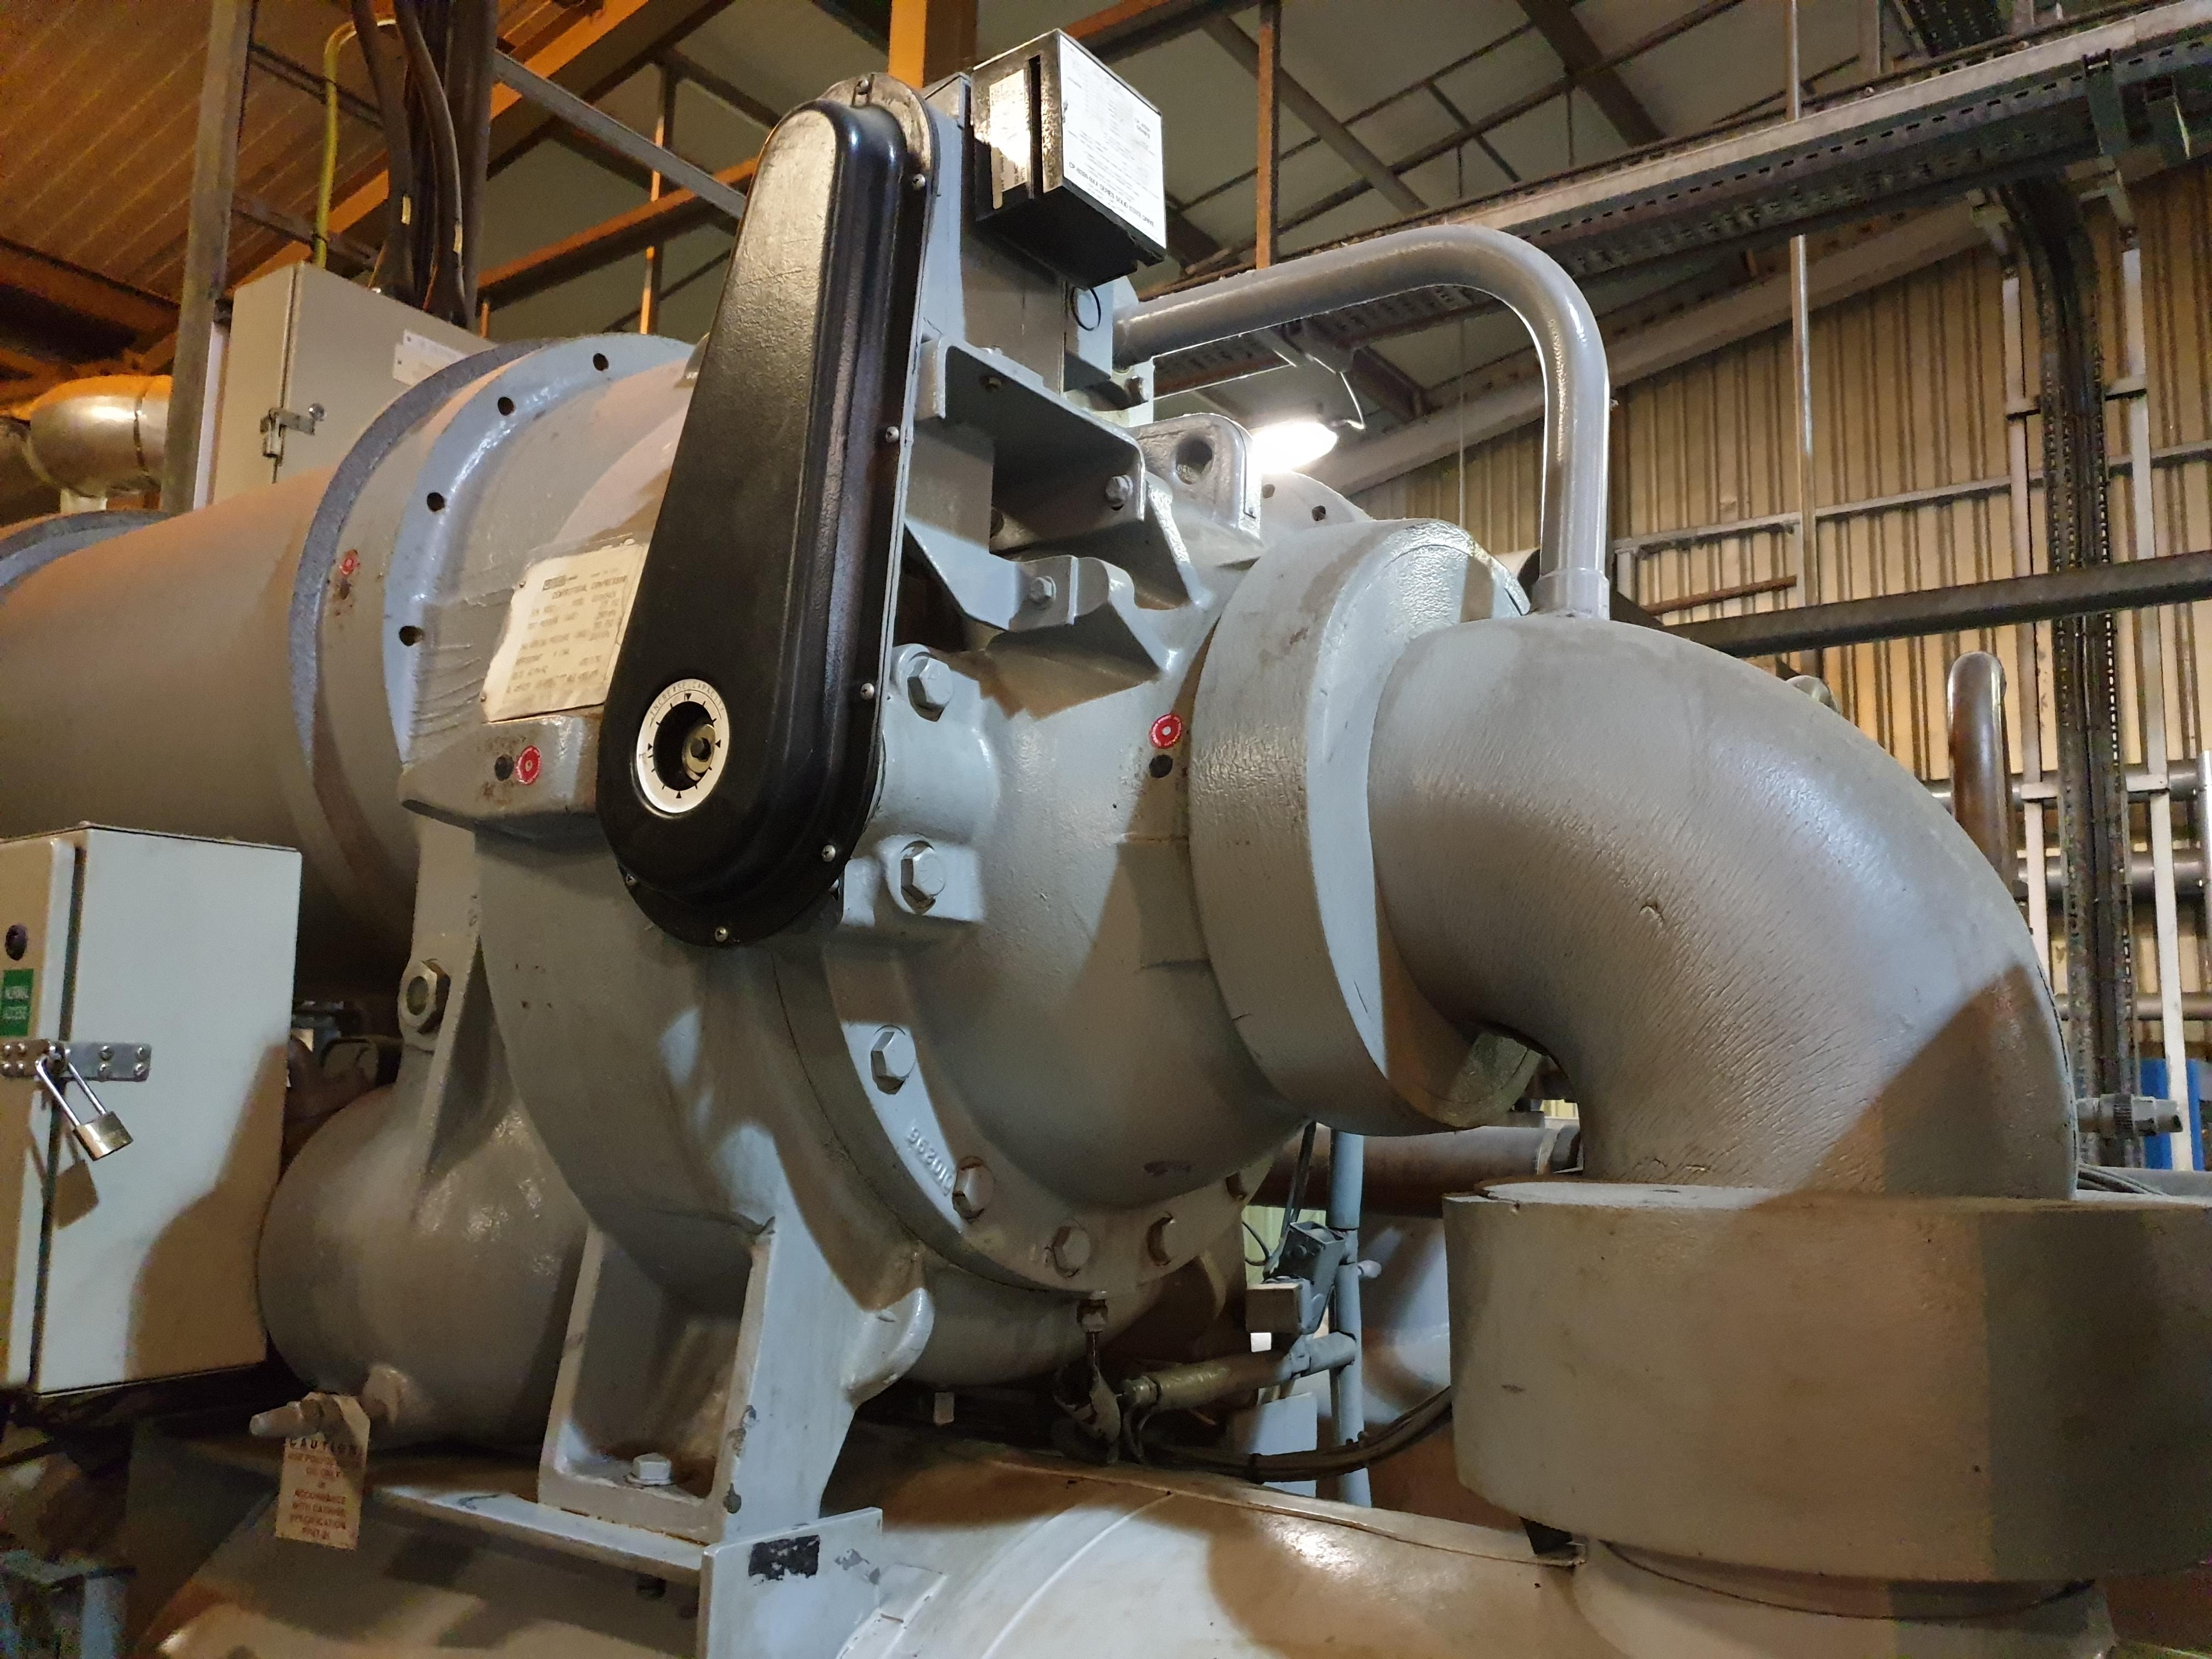 Centrifugal compressor rebuild of grey compressor in plant room